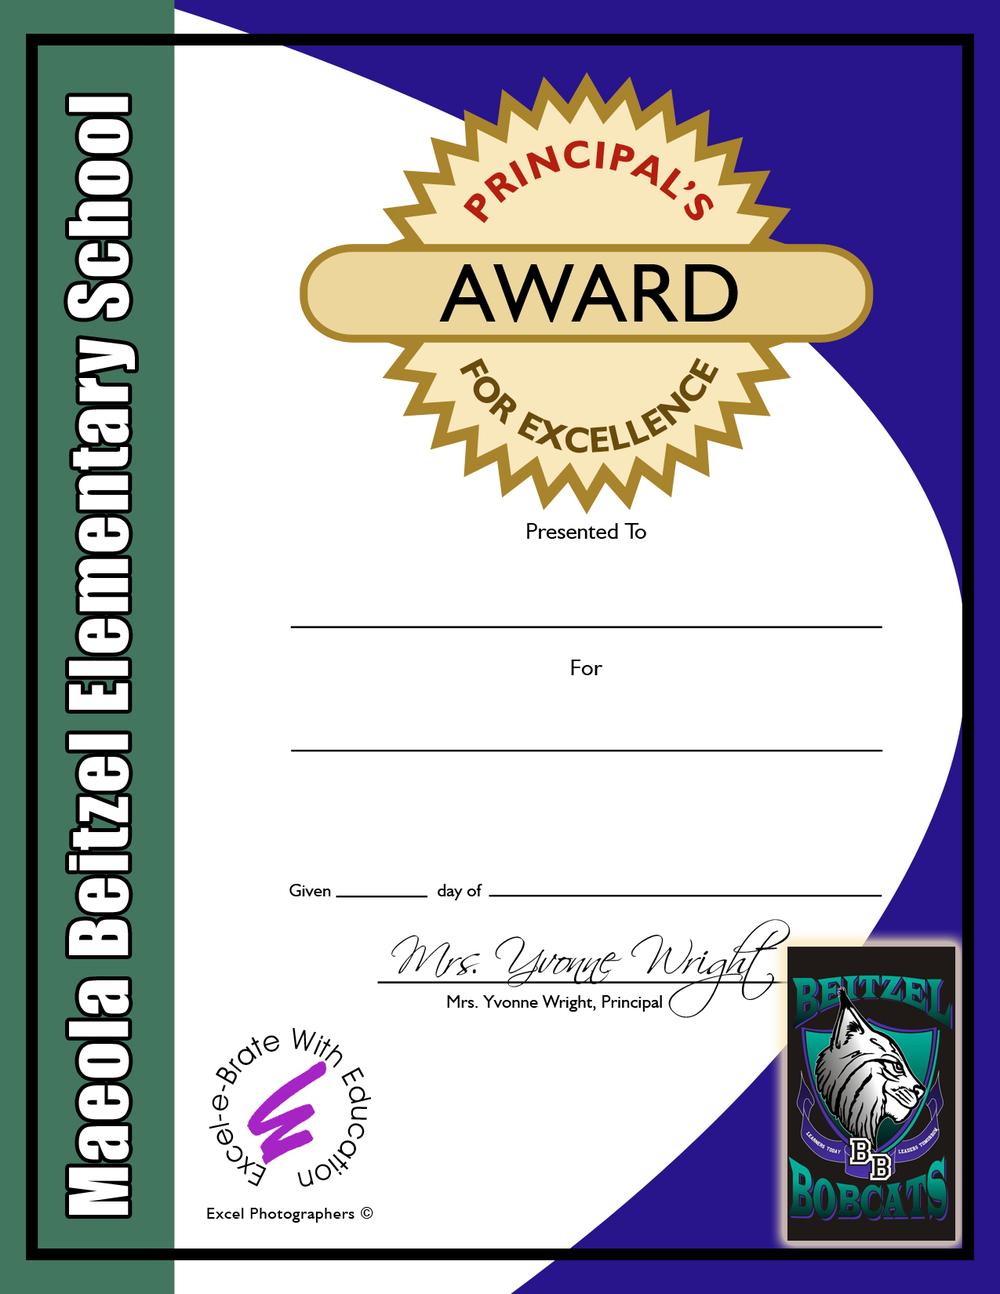 Award Item: PR-3